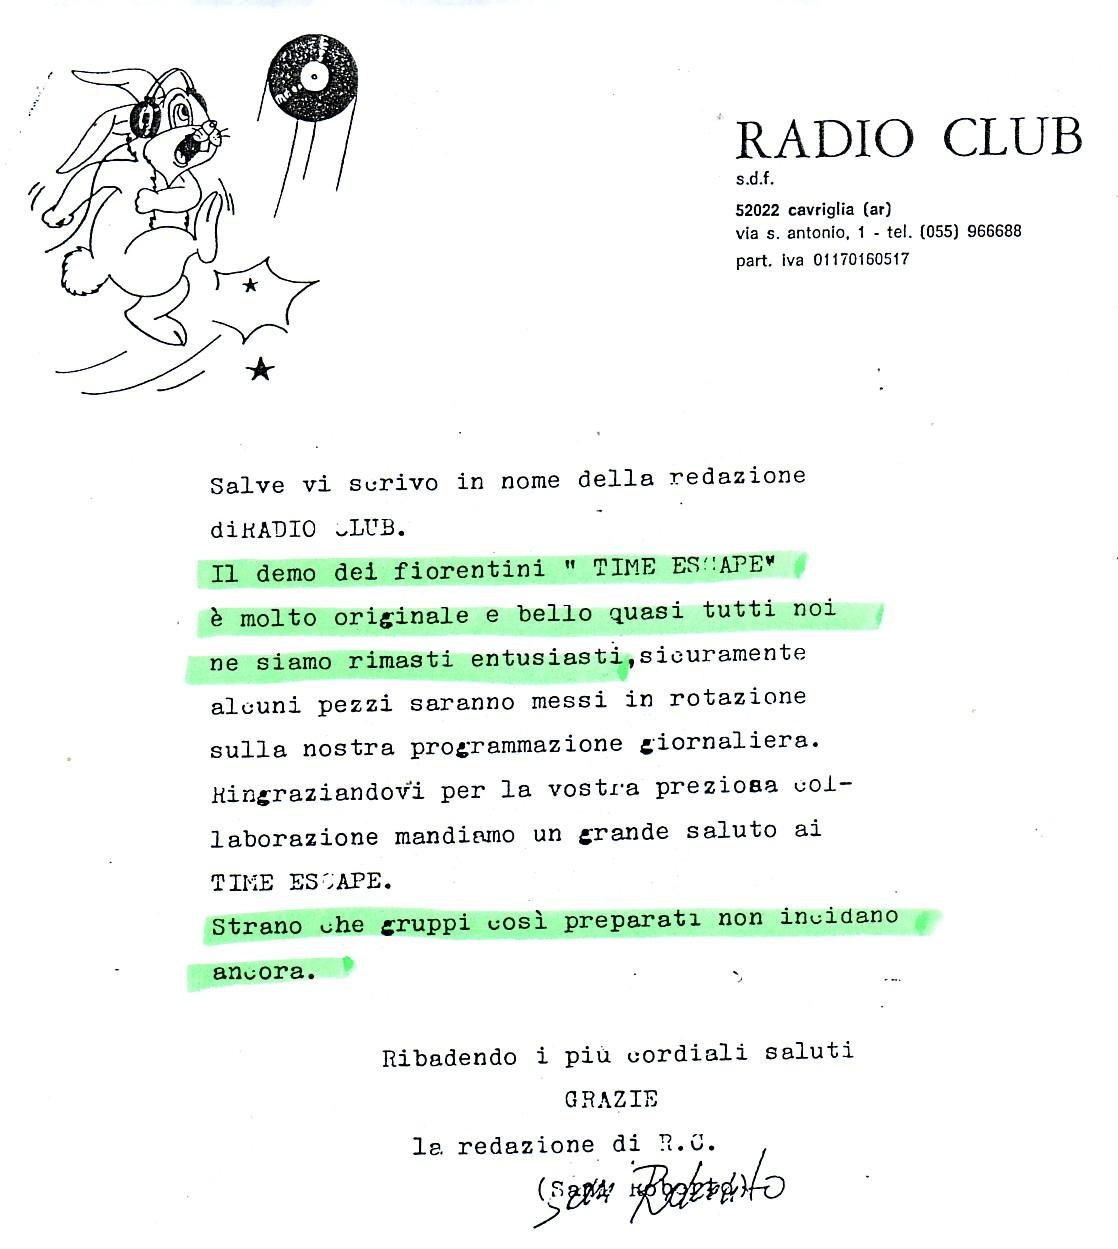 RADIO CLUB [2] (ITALY) - 1988